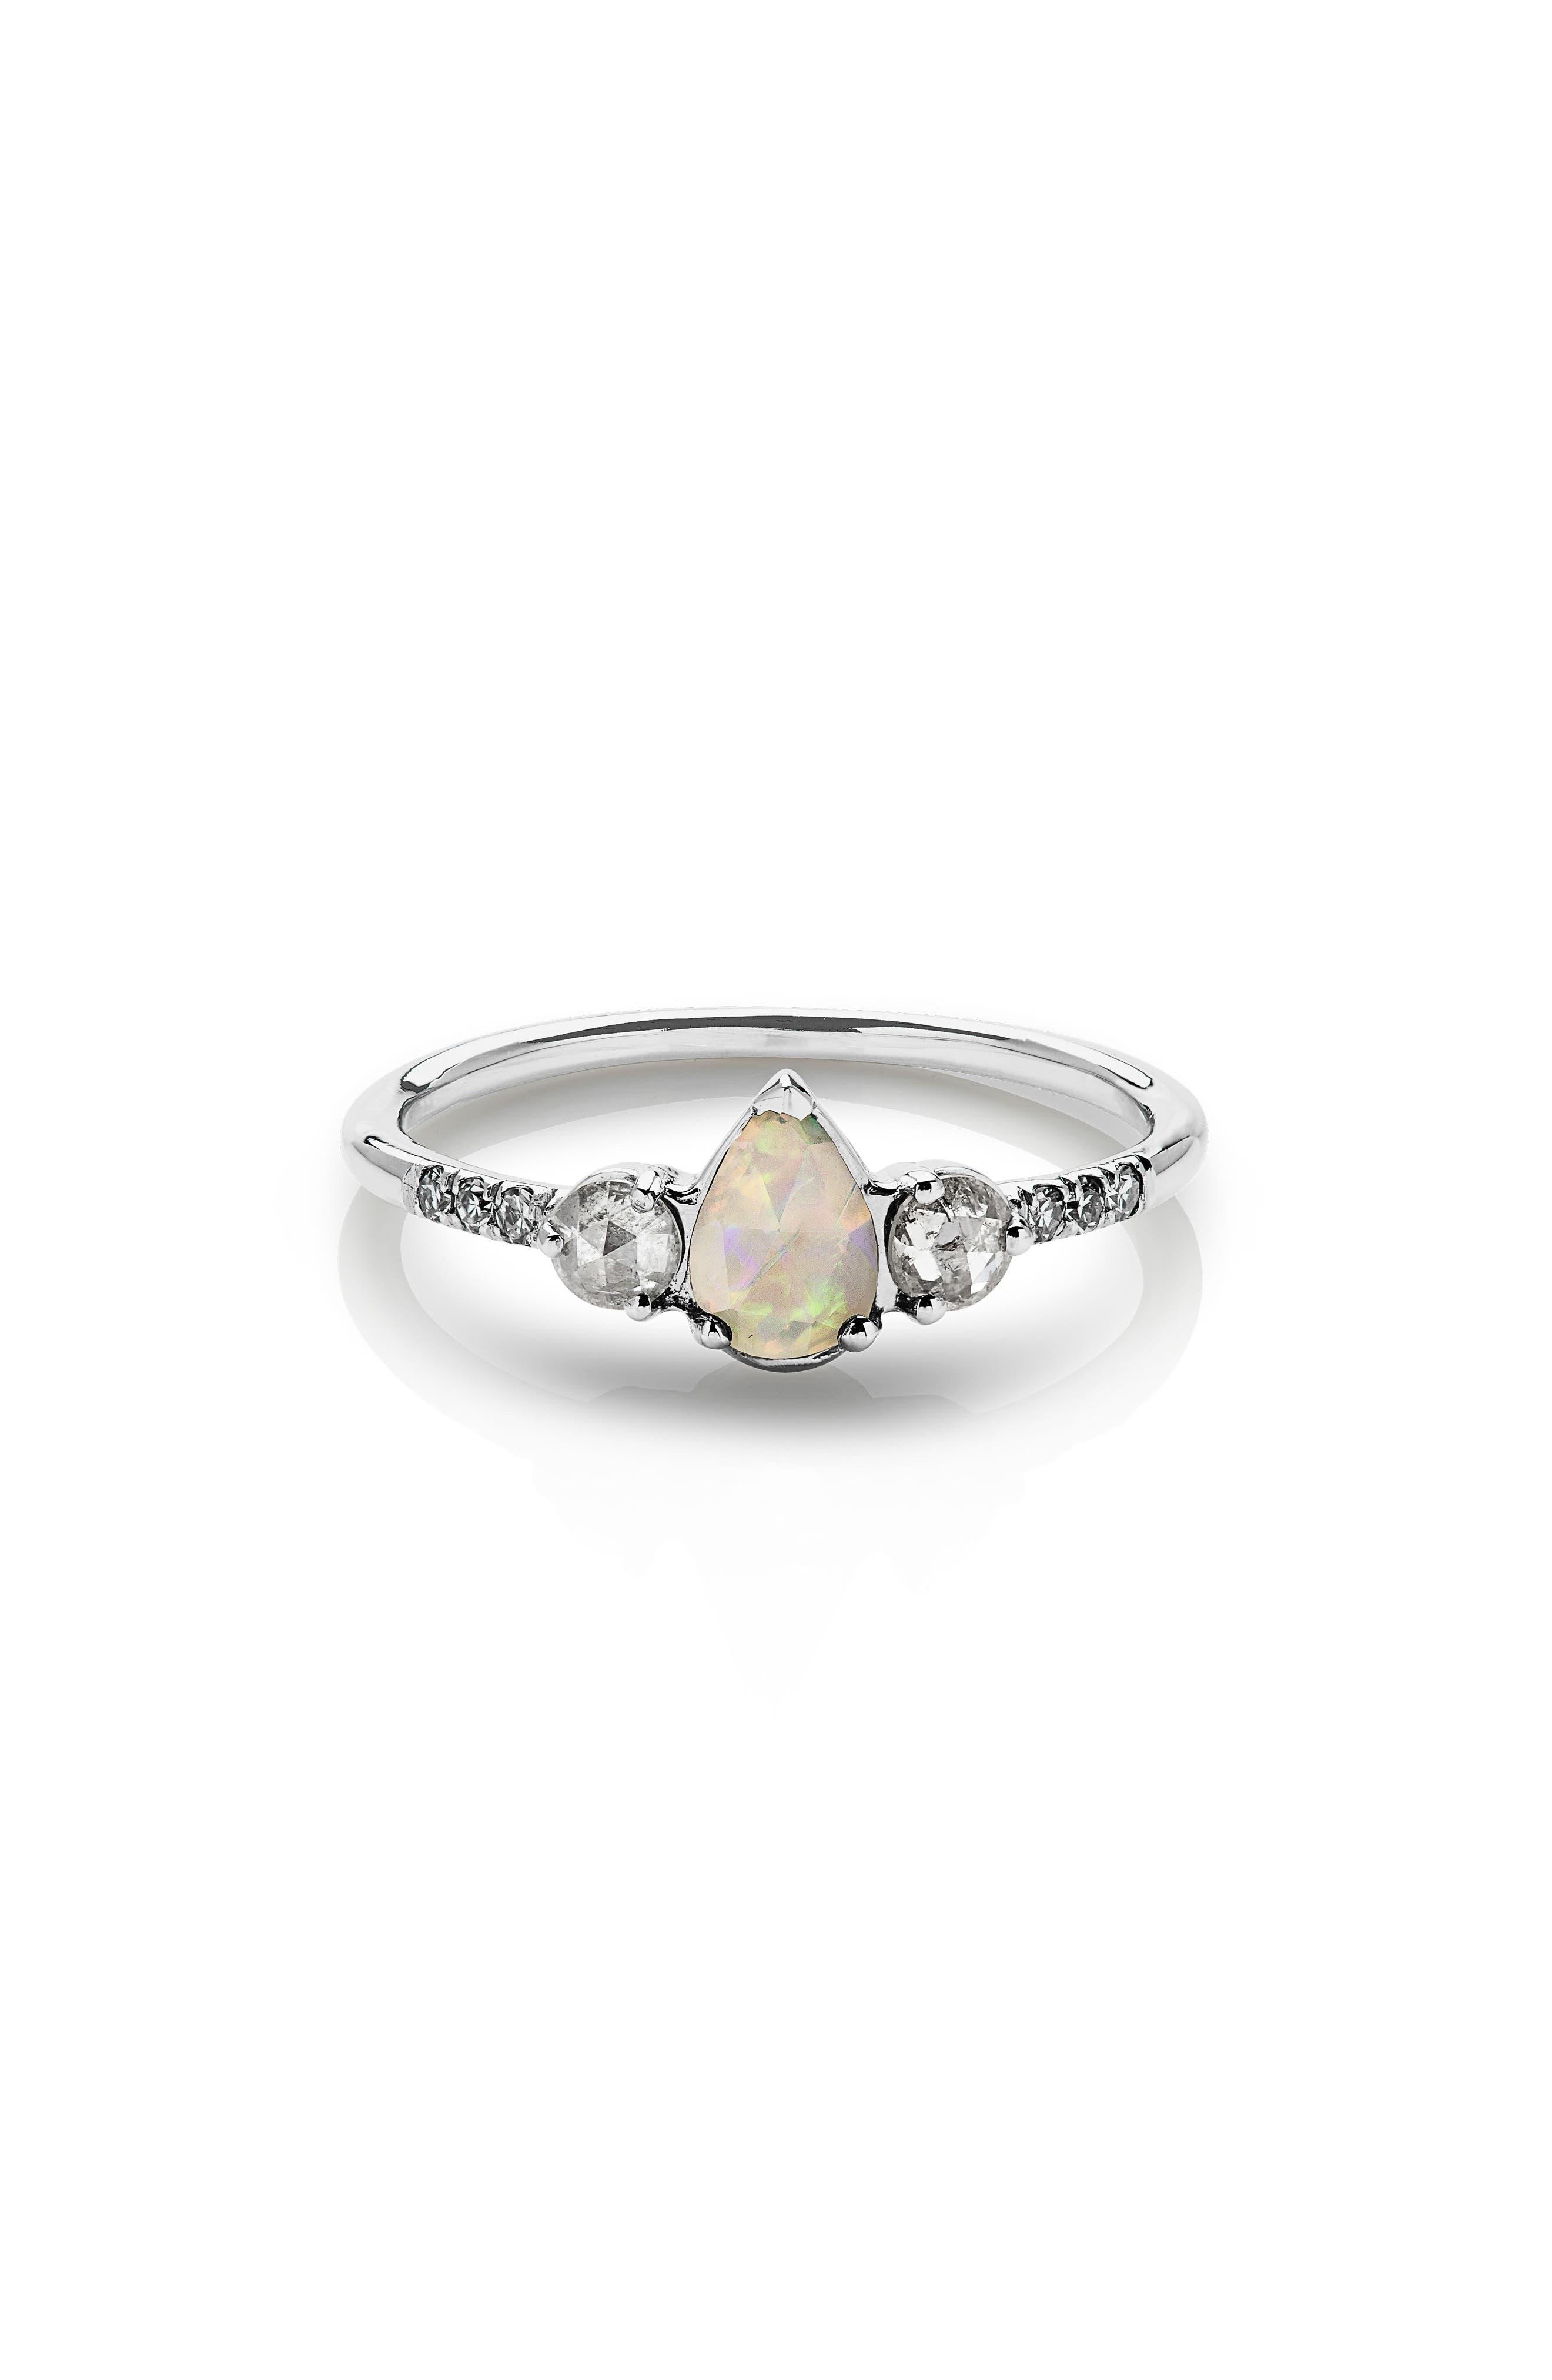 Radiance Opal & Diamond Ring,                             Main thumbnail 1, color,                             WHITE GOLD/ OPAL